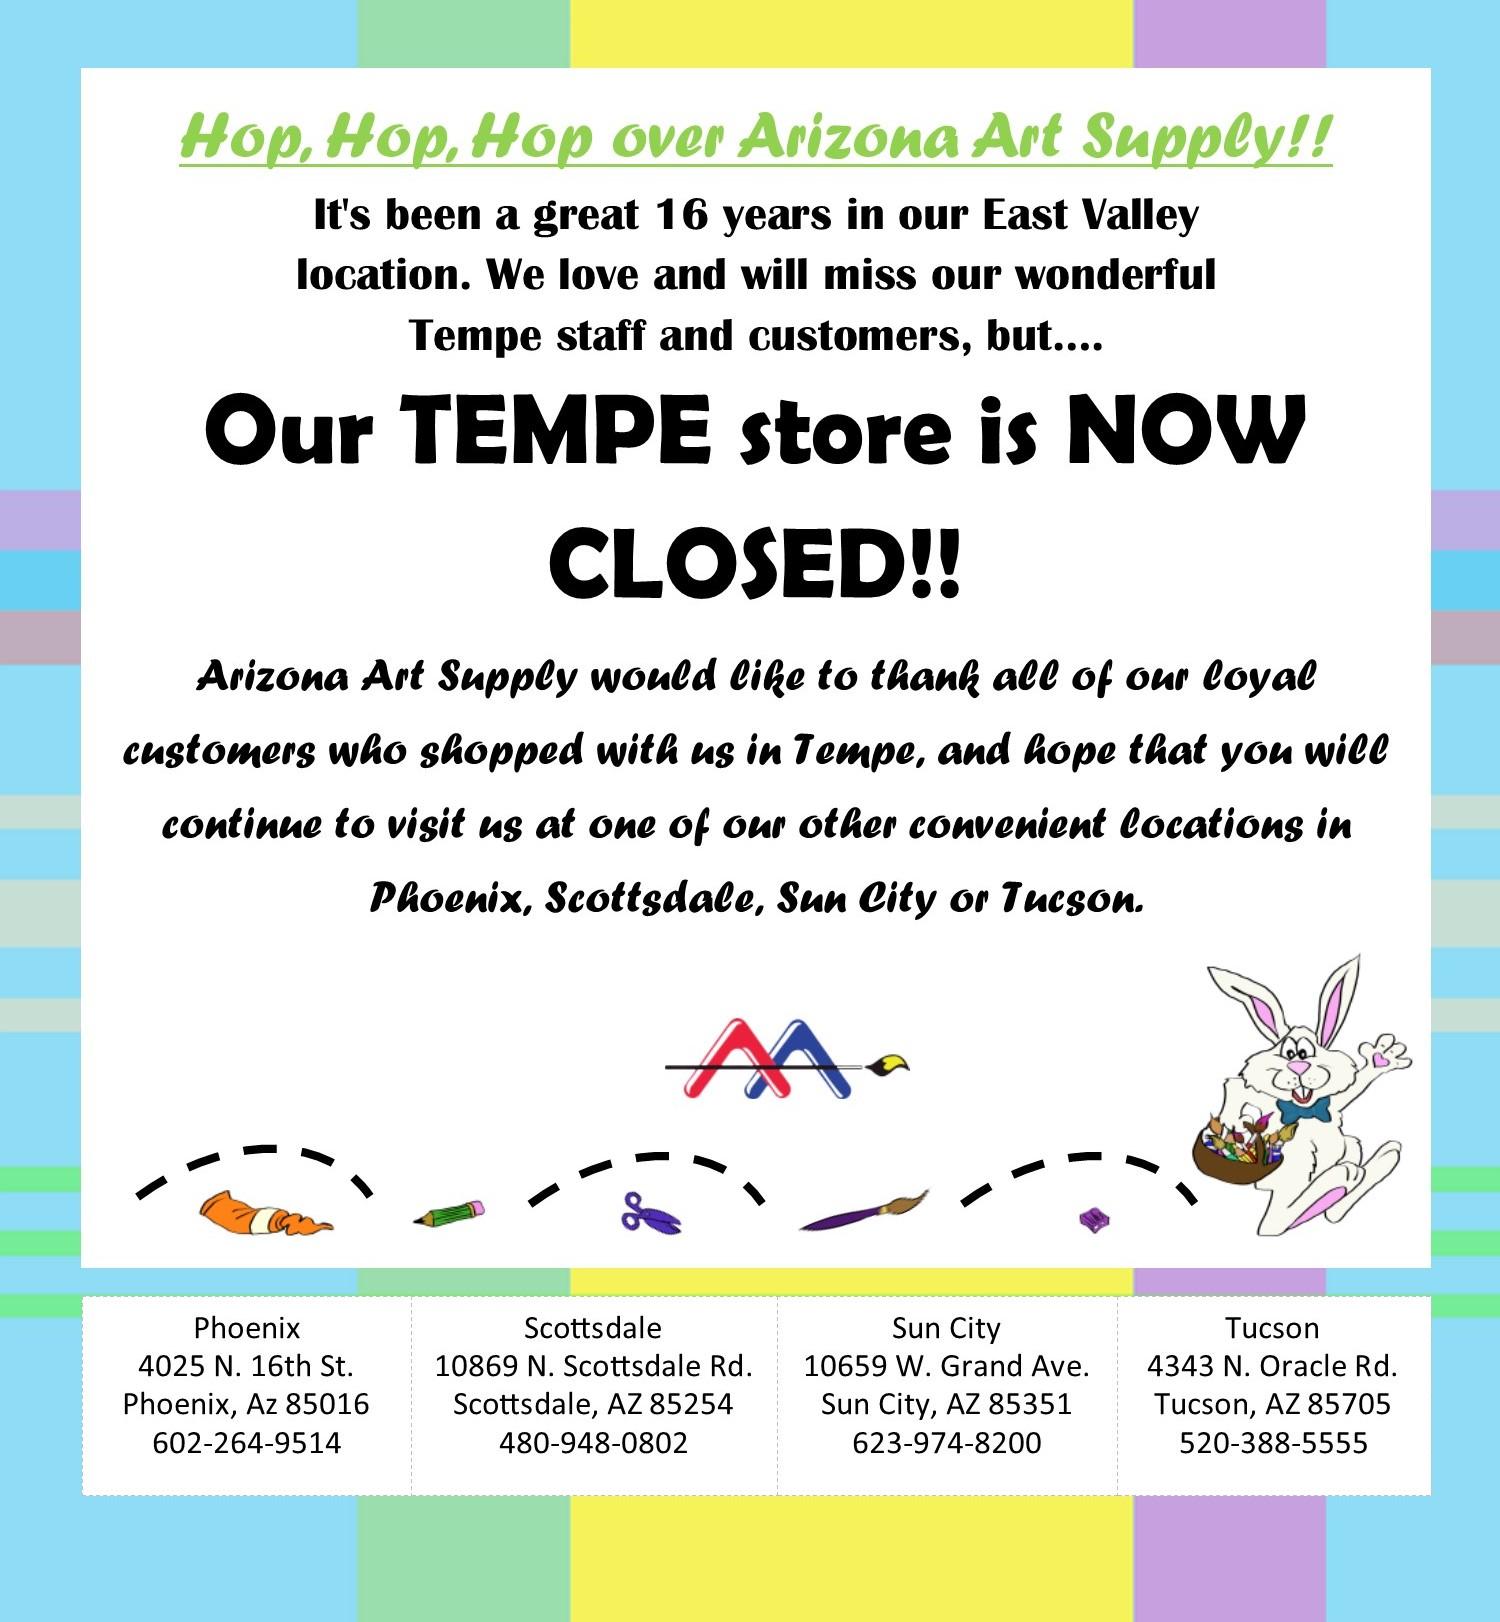 TEMPE Location now CLOSED! - Arizona Art Supply